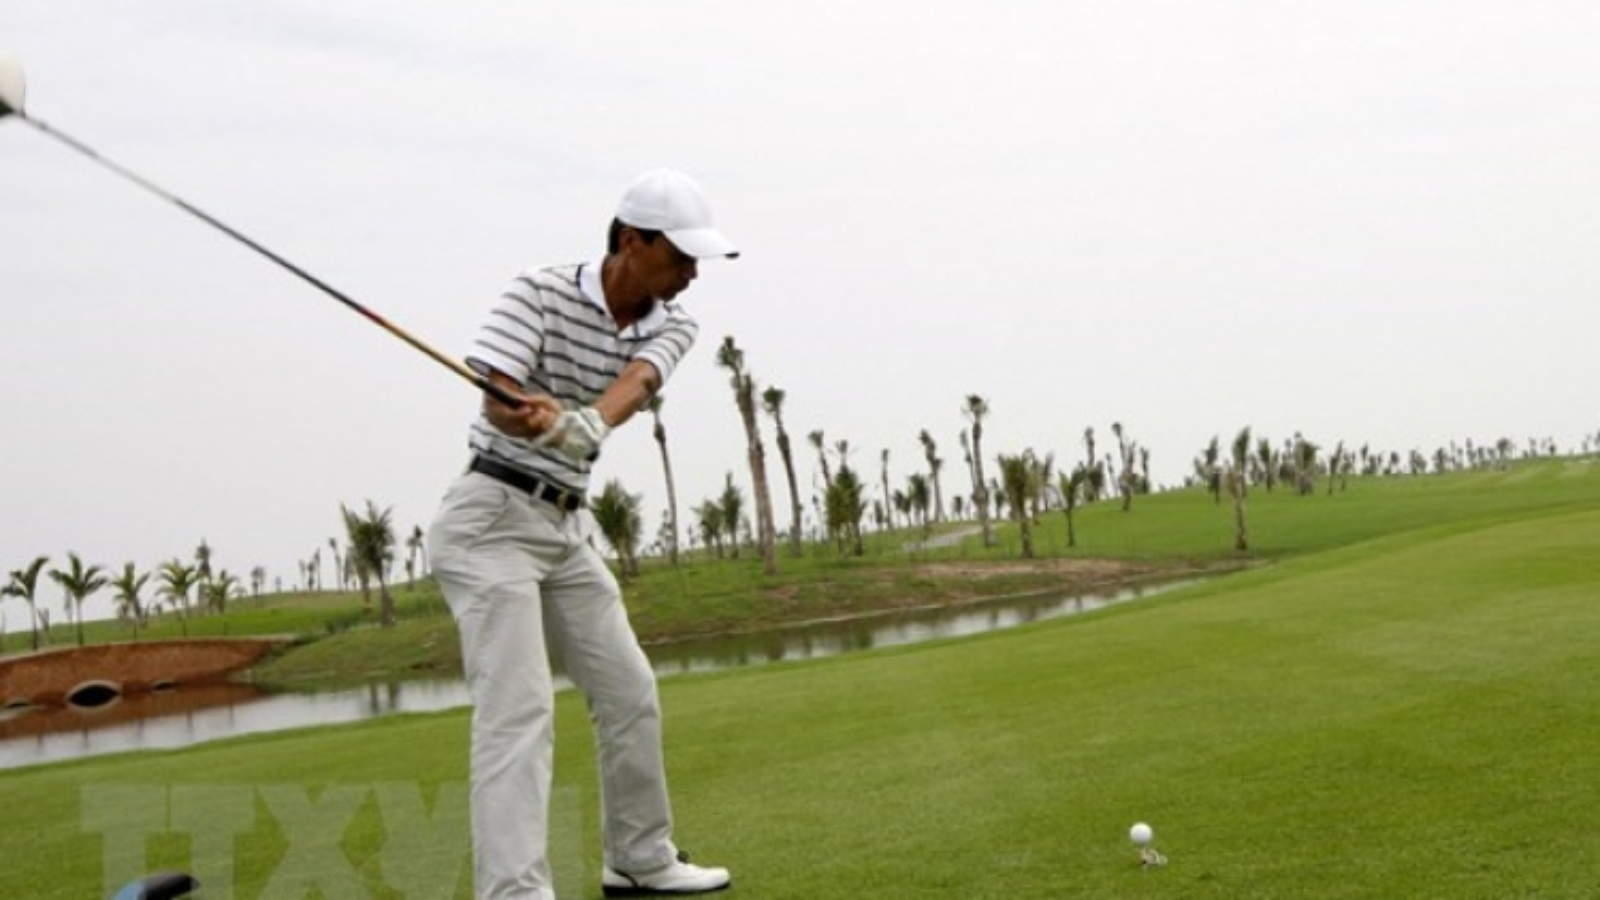 Vietnam has huge potential for golf tourism